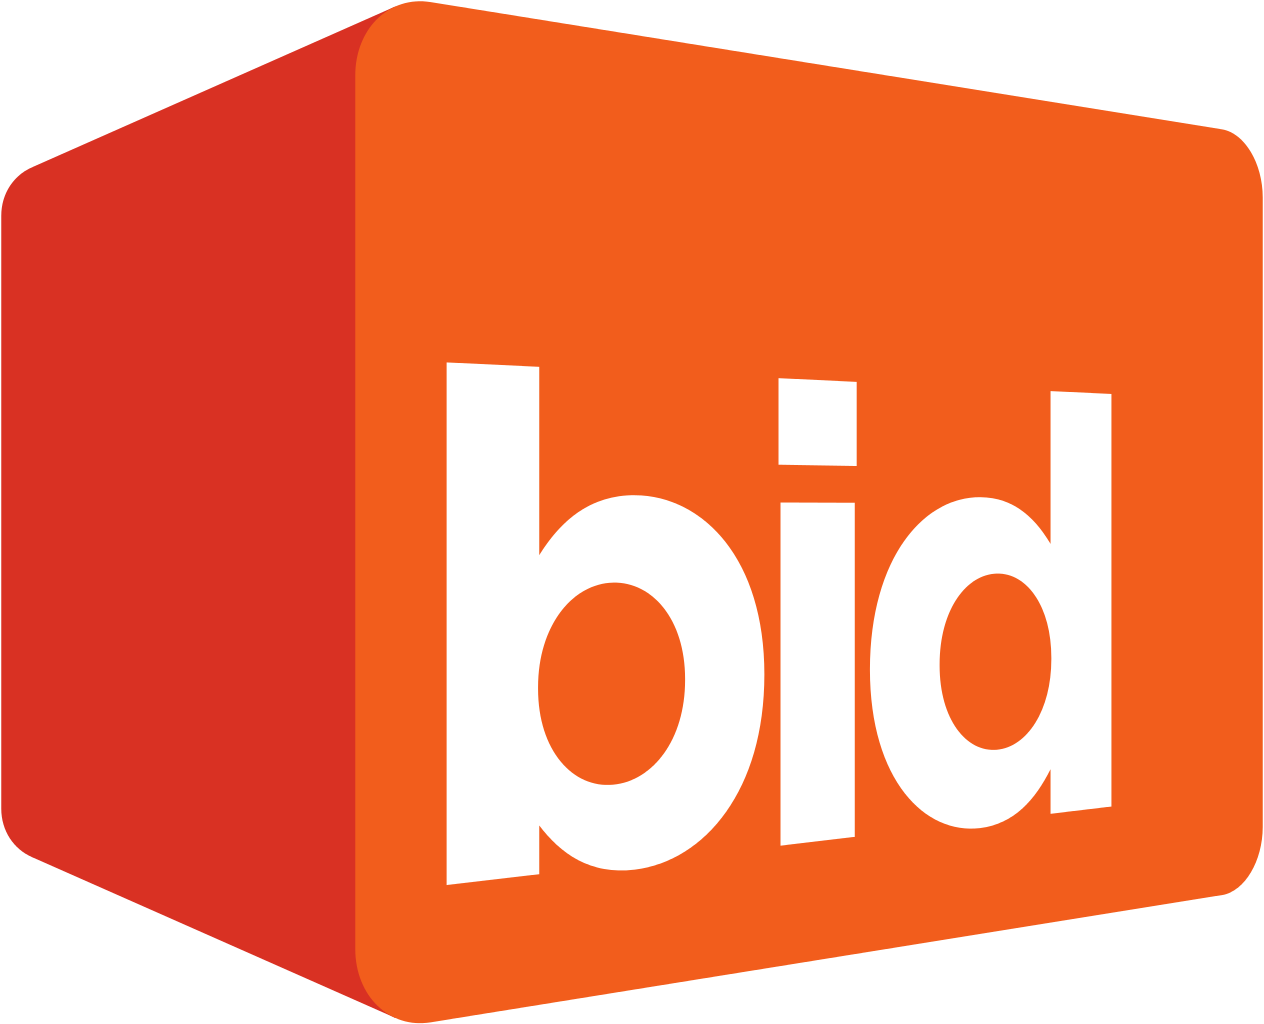 File:Bid logo.svg.